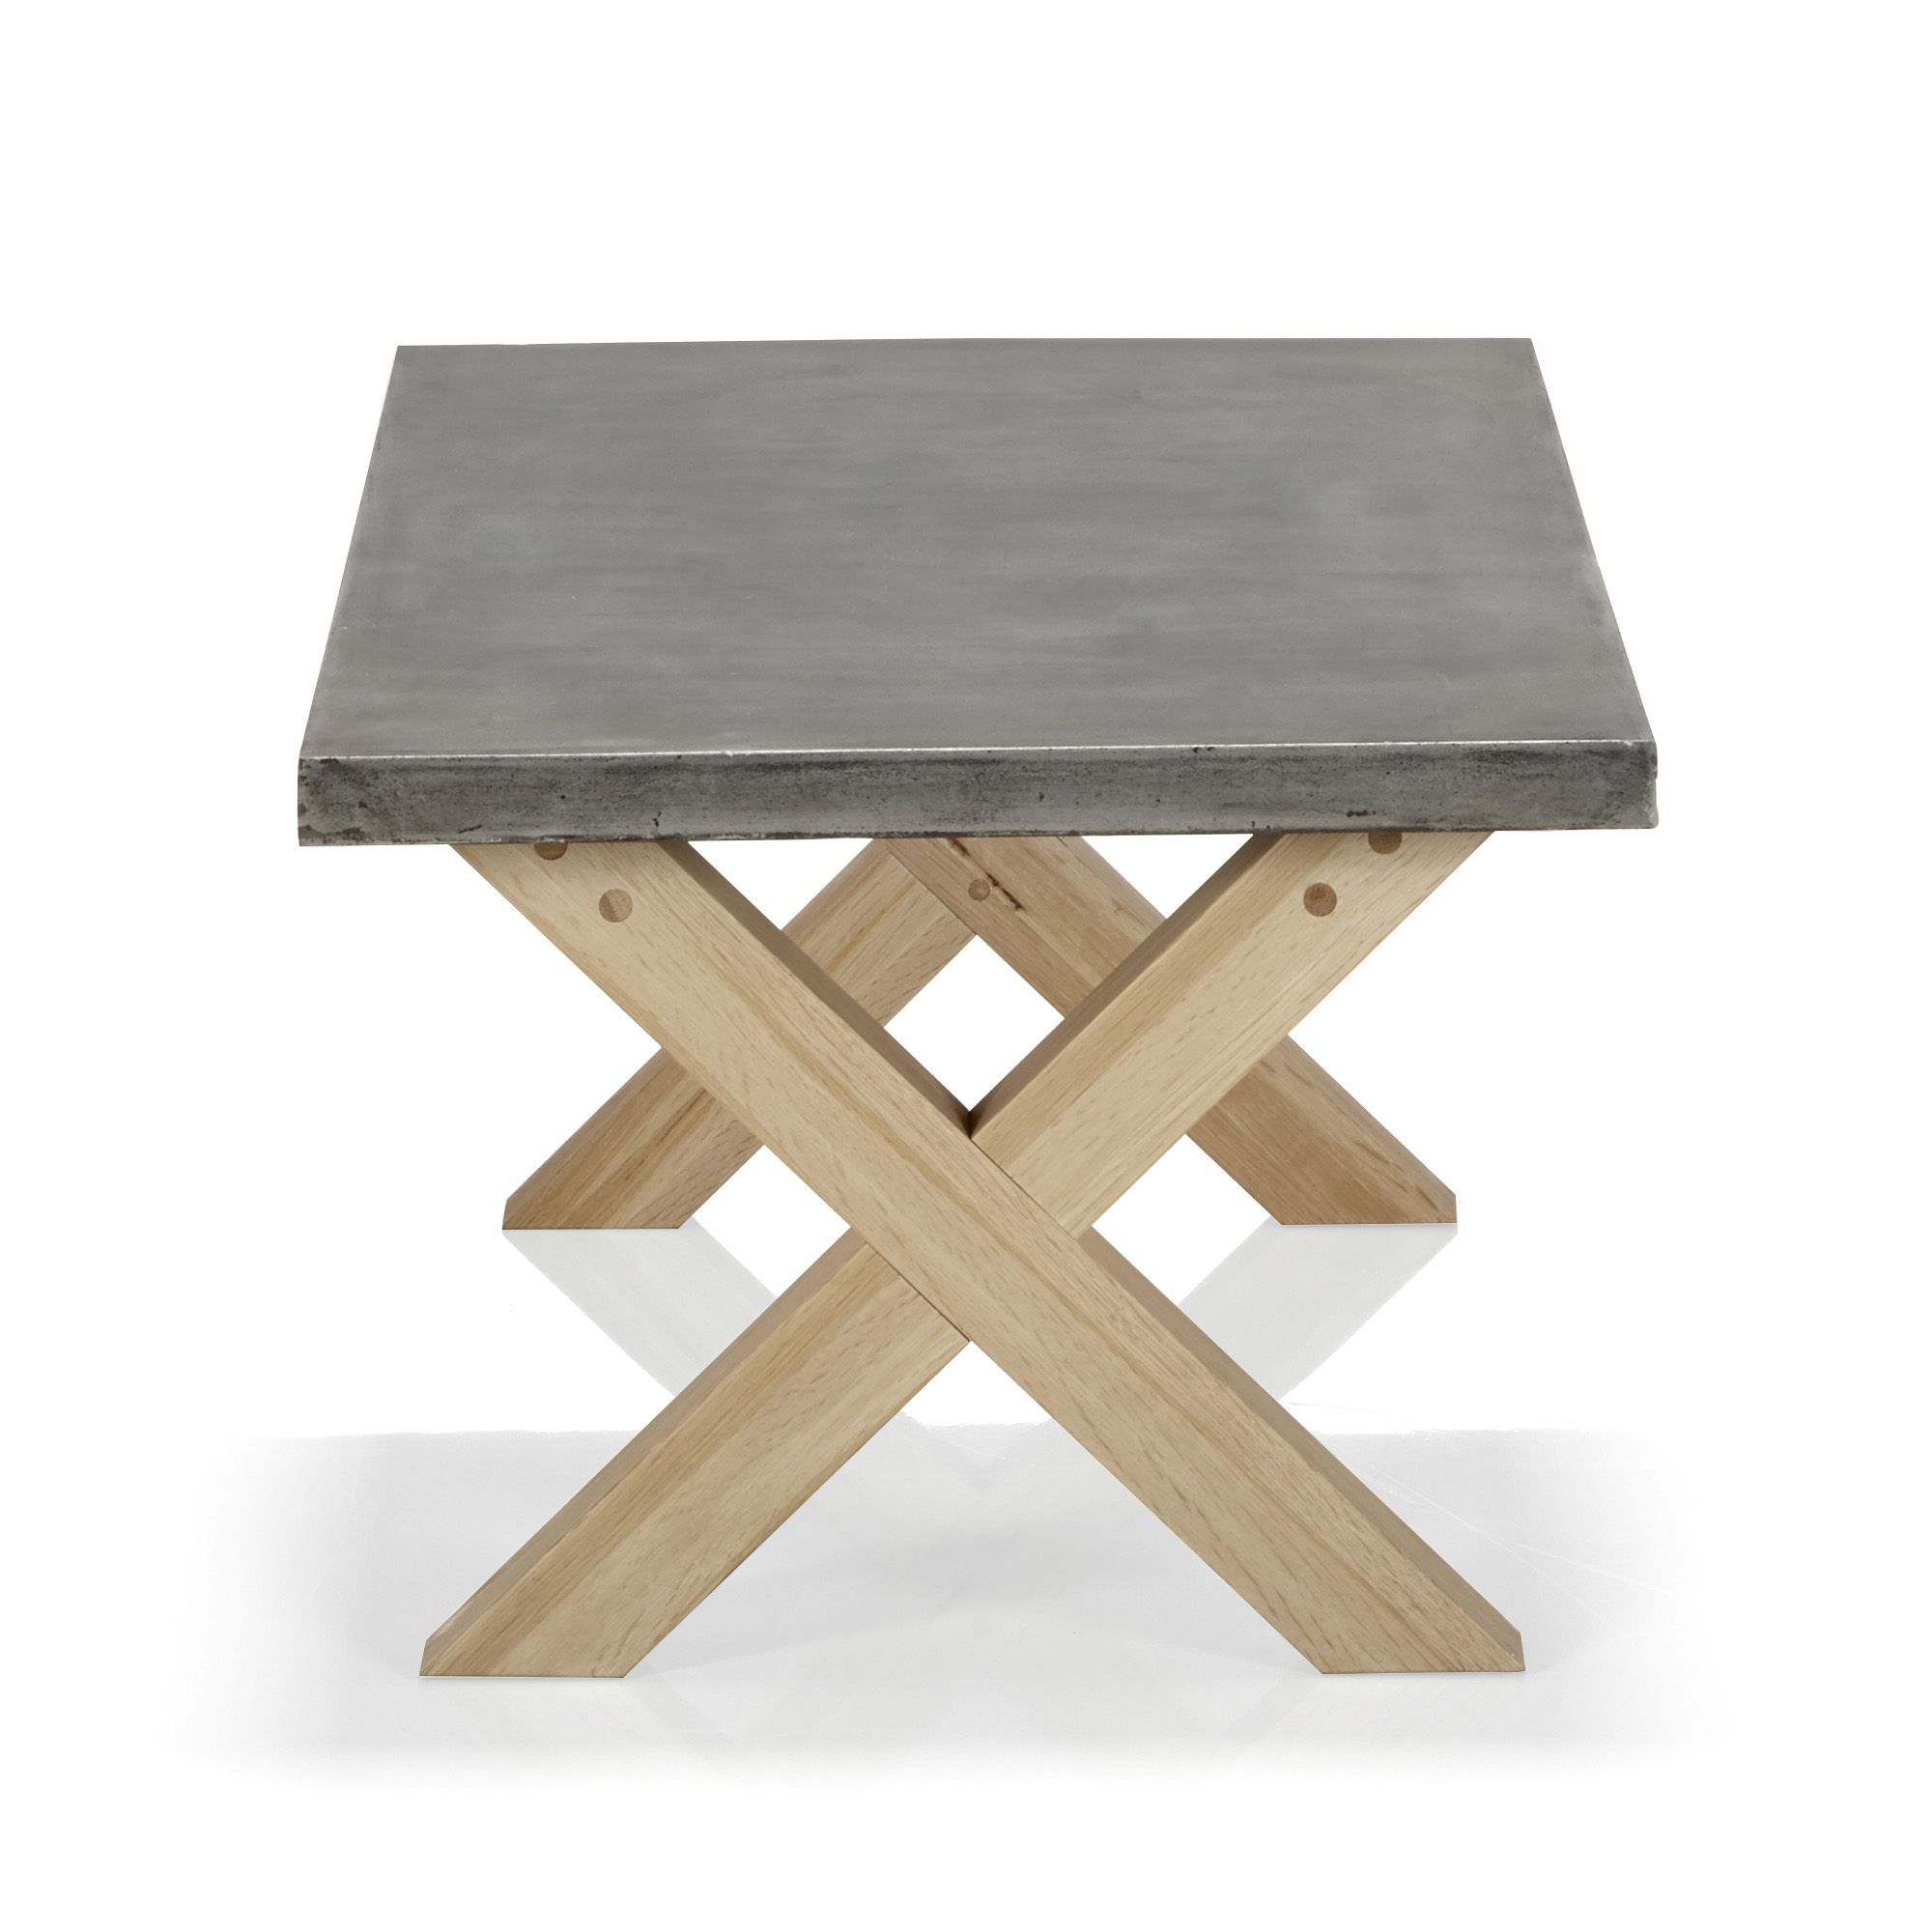 Table Basse En Ch Ne Avec Plateau Aspect B Ton Cir Peker Les  # Salon Meuble Beton